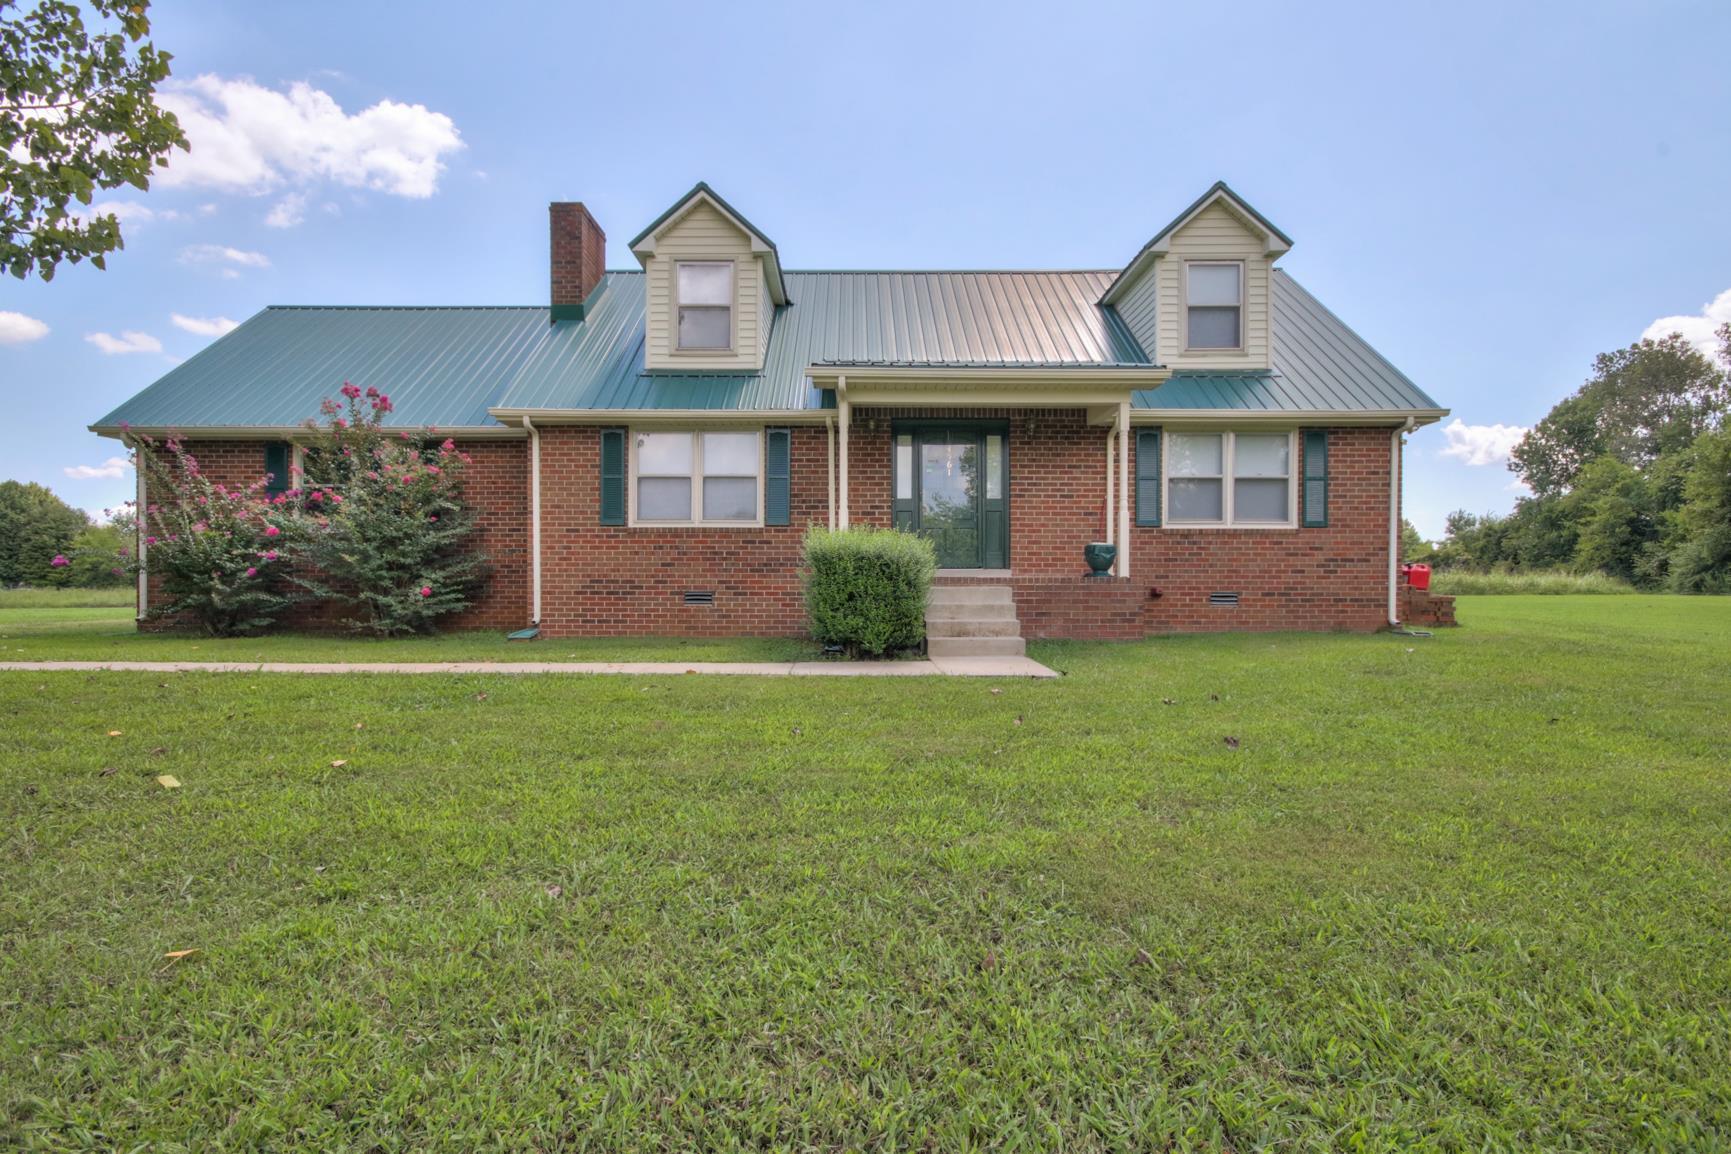 4561 Rucker Christiana Rd, Christiana, TN 37037 - Christiana, TN real estate listing